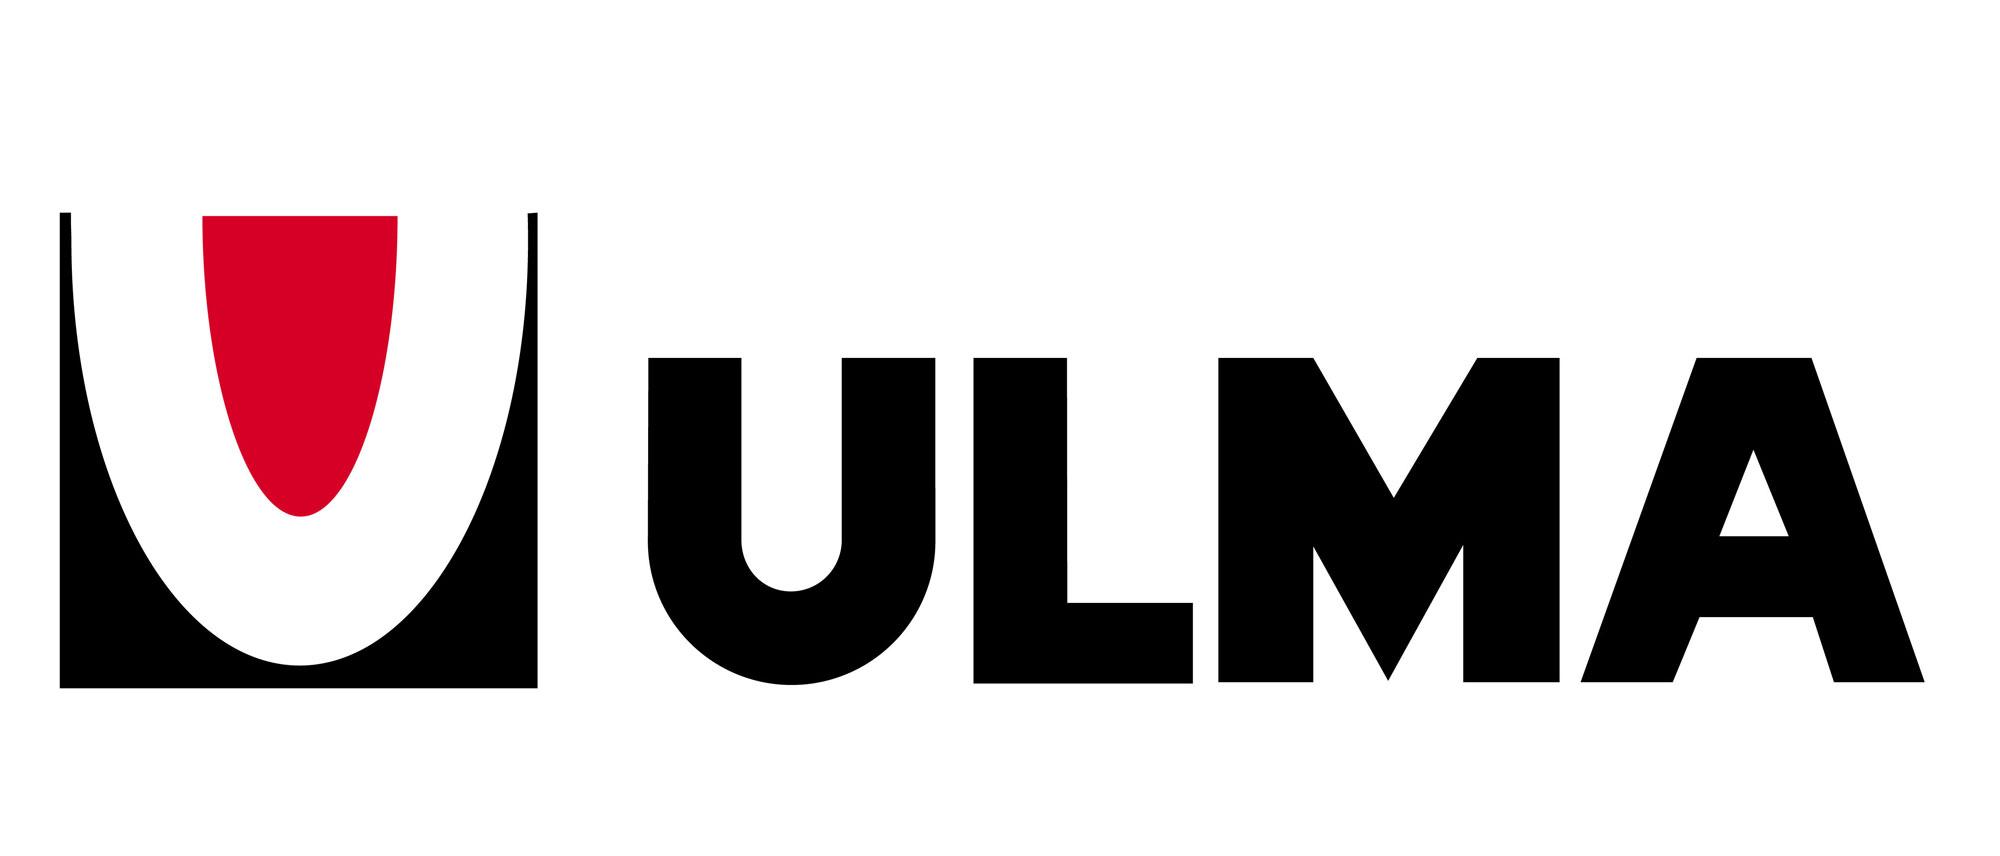 https://prestoninternational.com/wp-content/uploads/2018/06/a315fef0-2918-49b9-a3e1-f1f3aacf0878ULMA_Group_logo.jpg